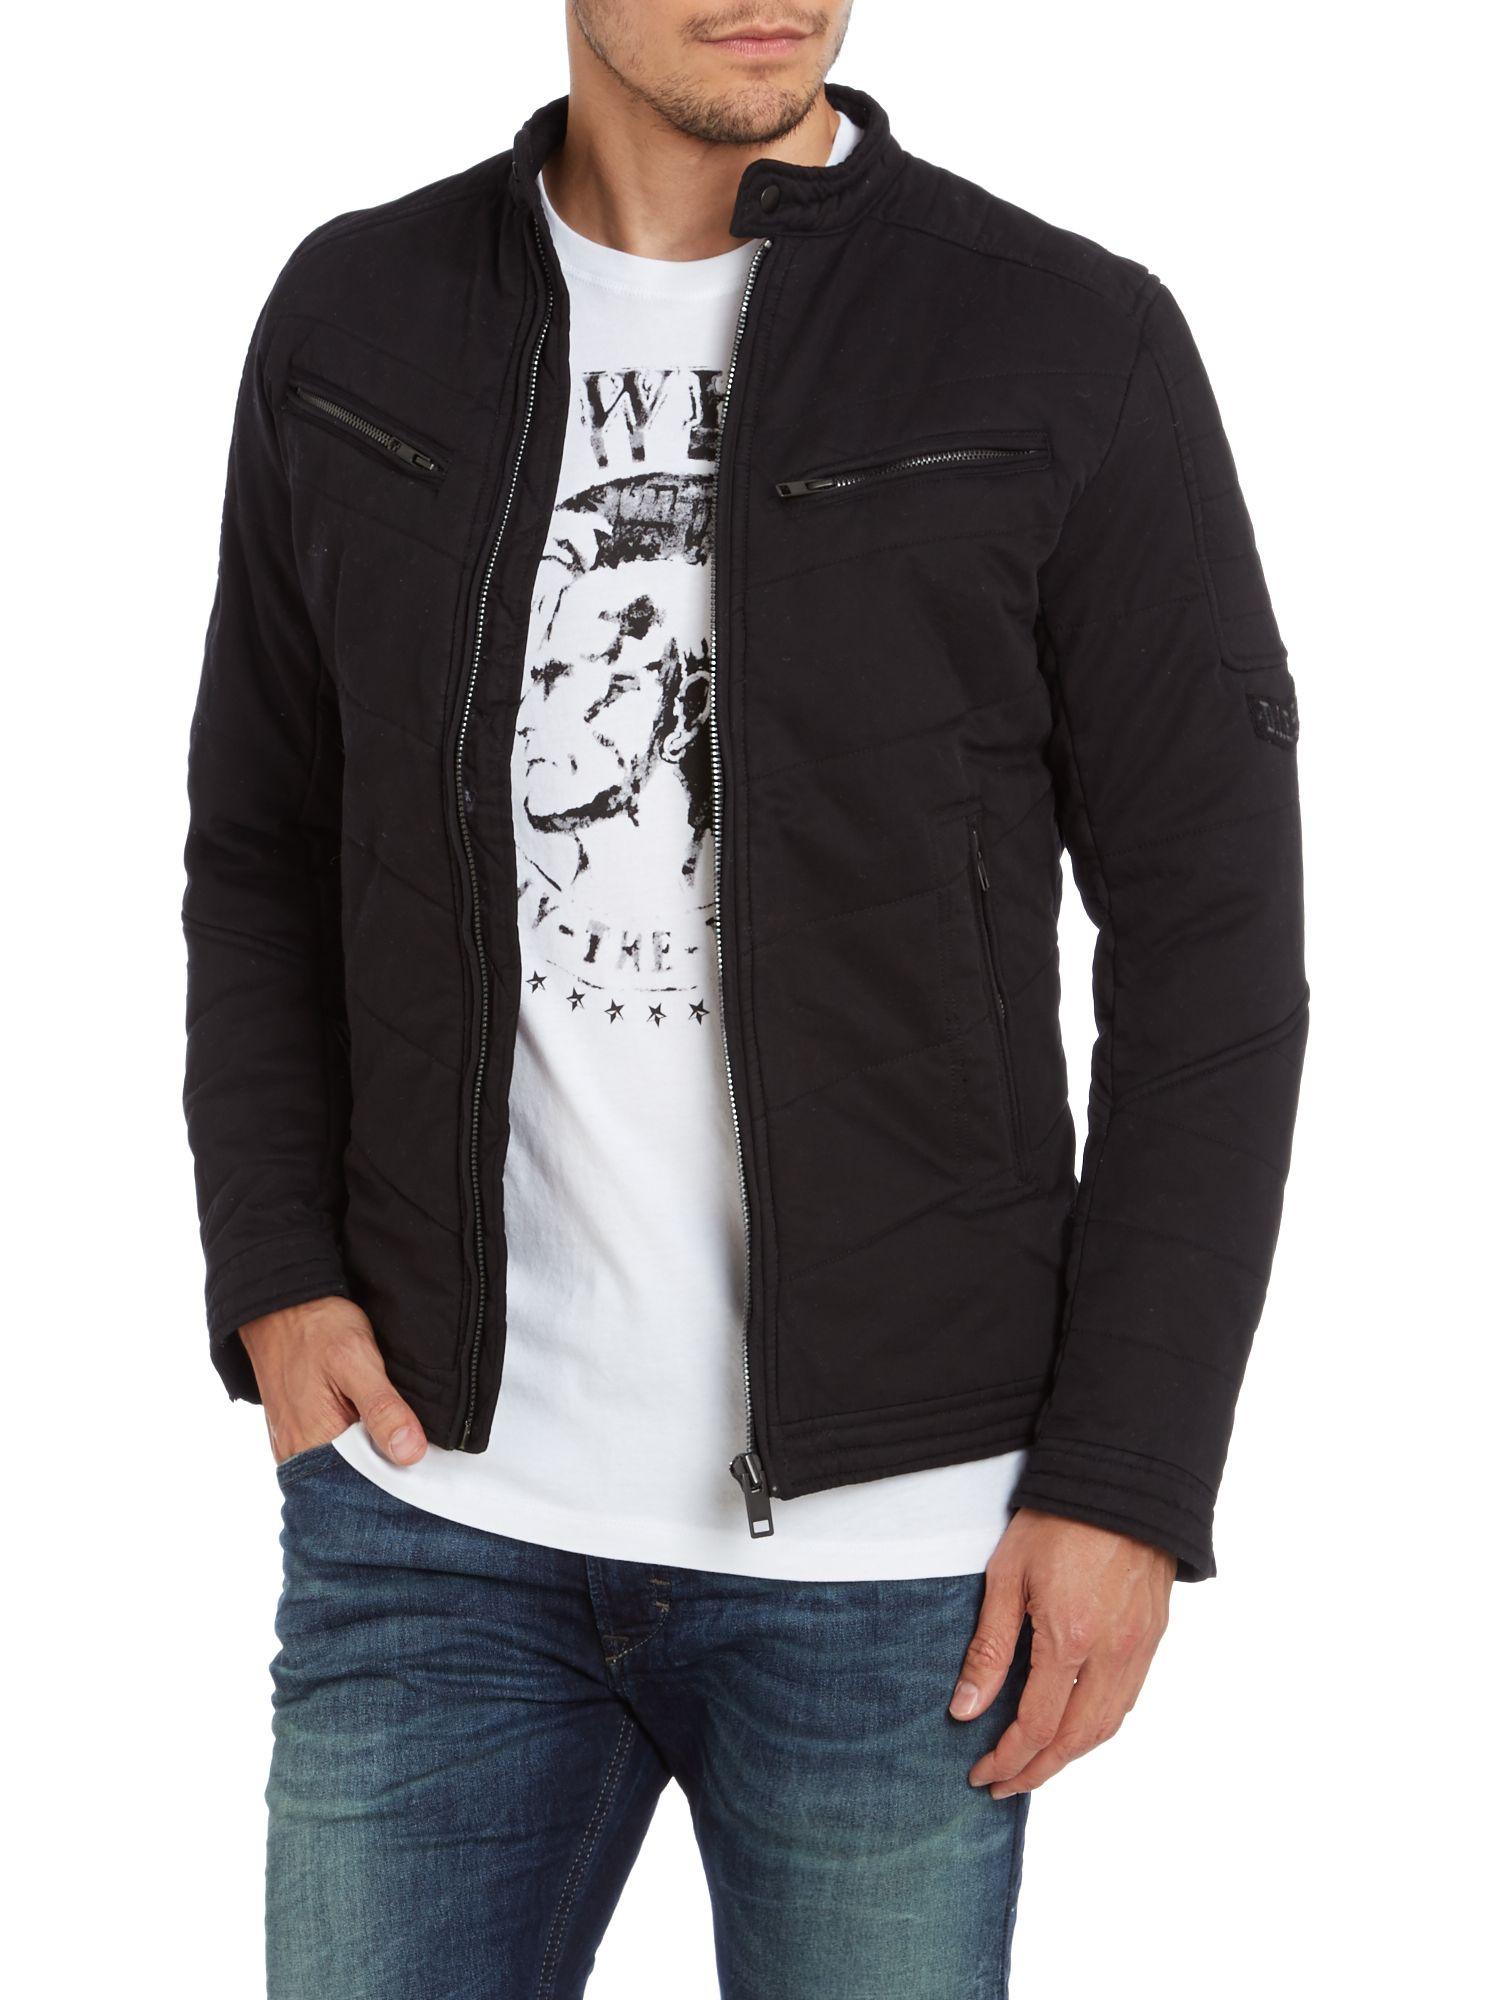 Mens jacket cotton - Gallery